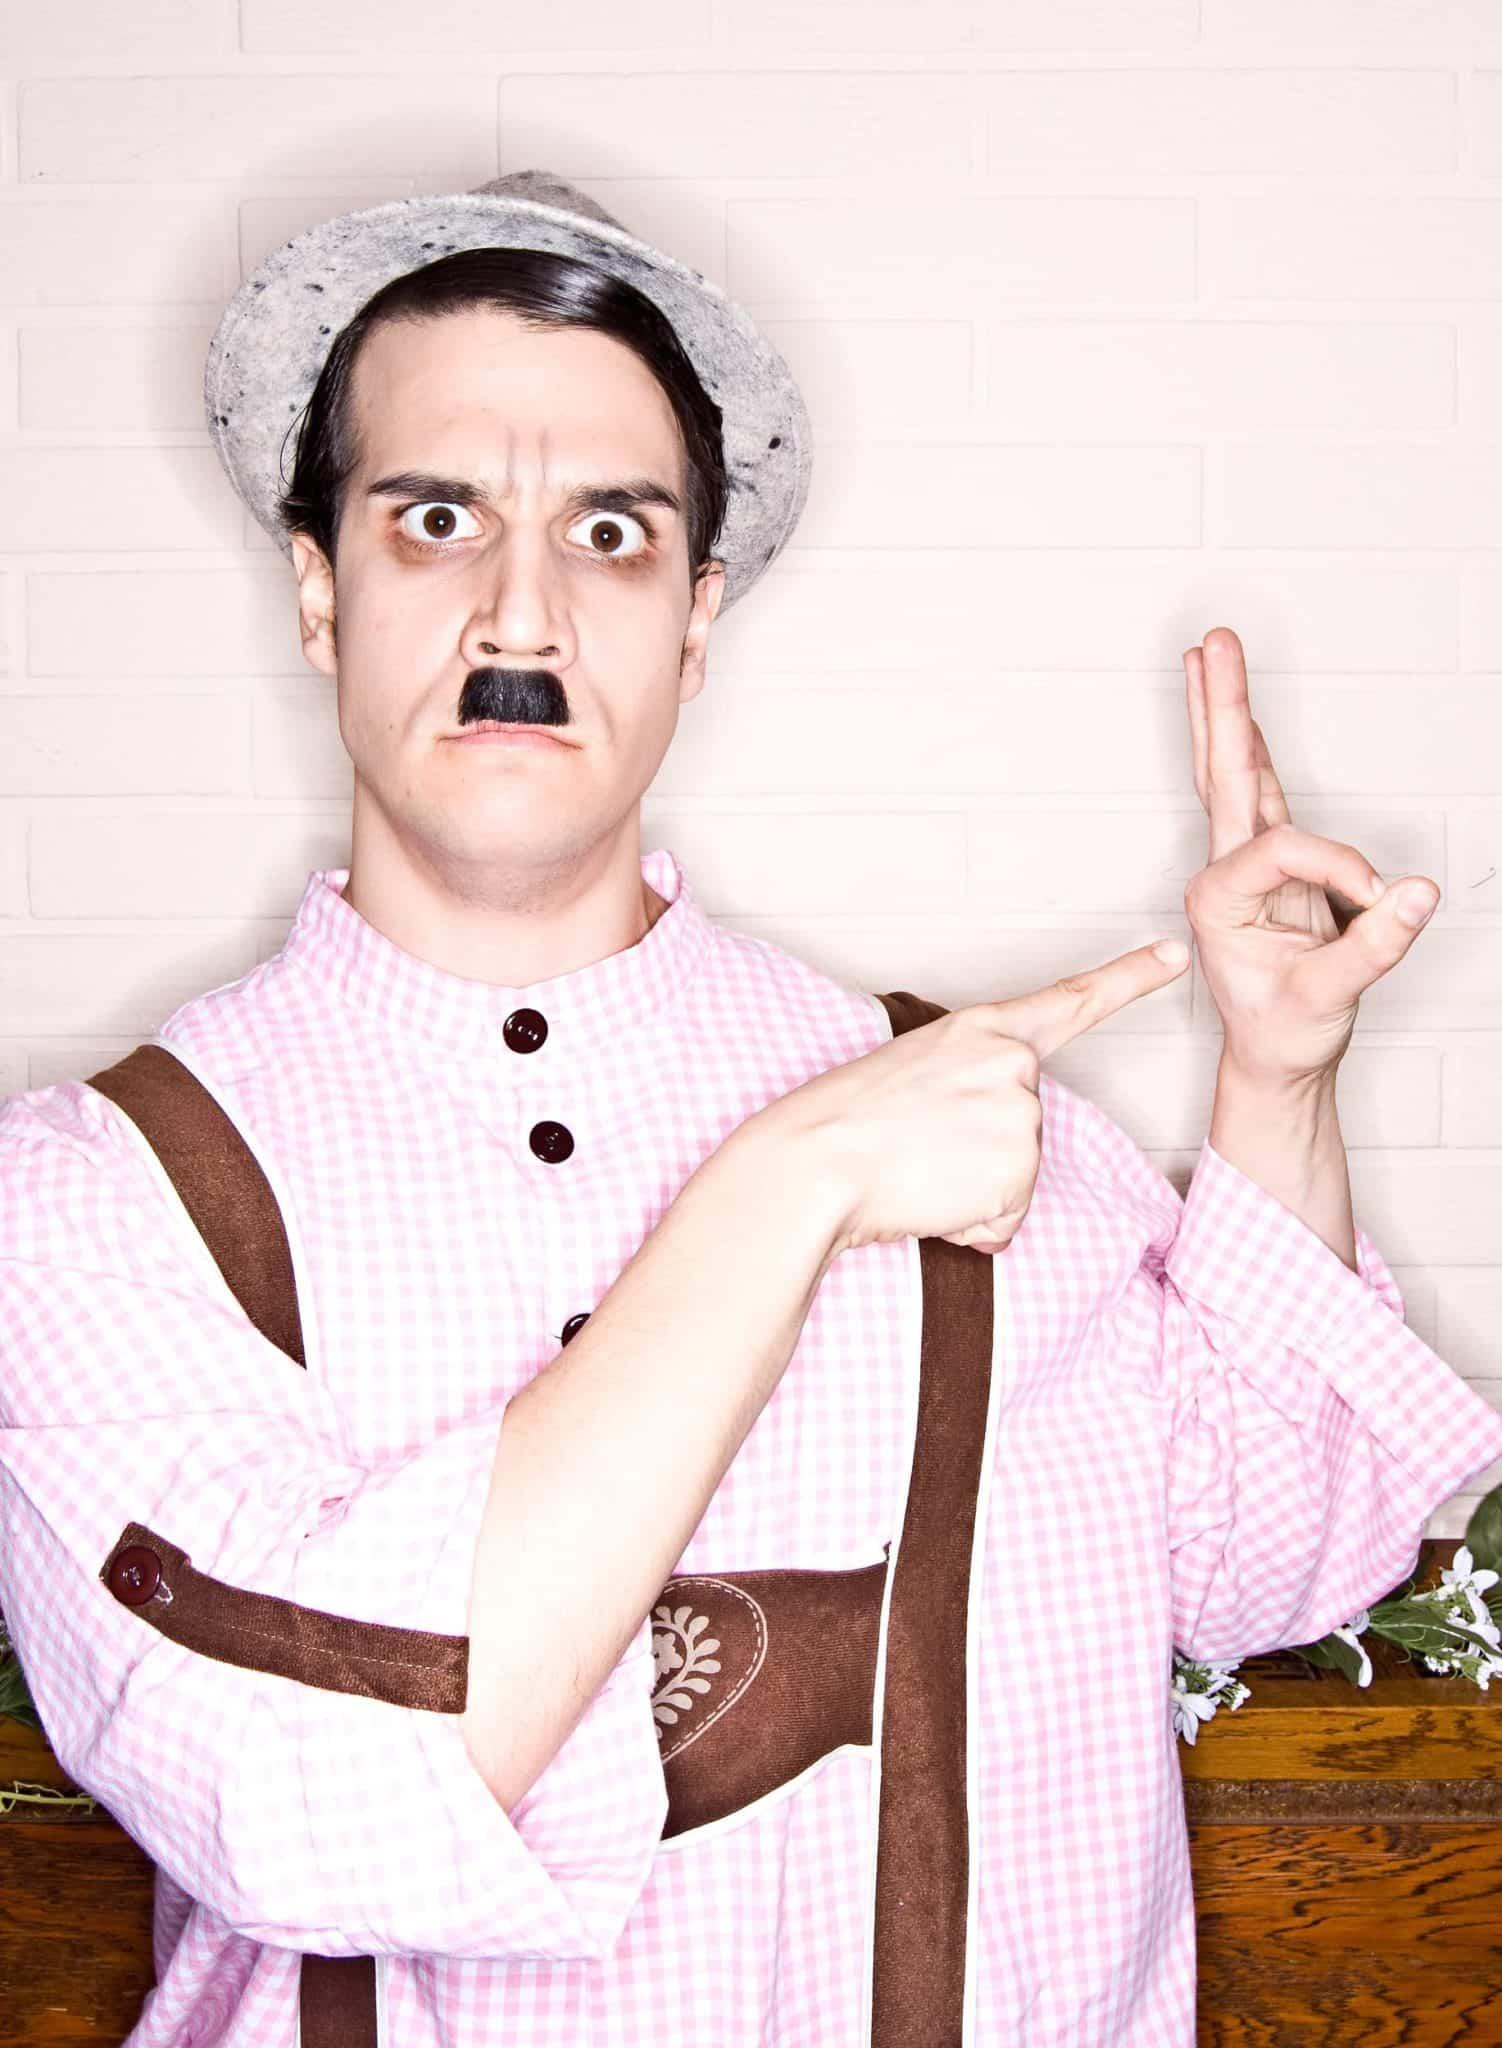 pure Adolf